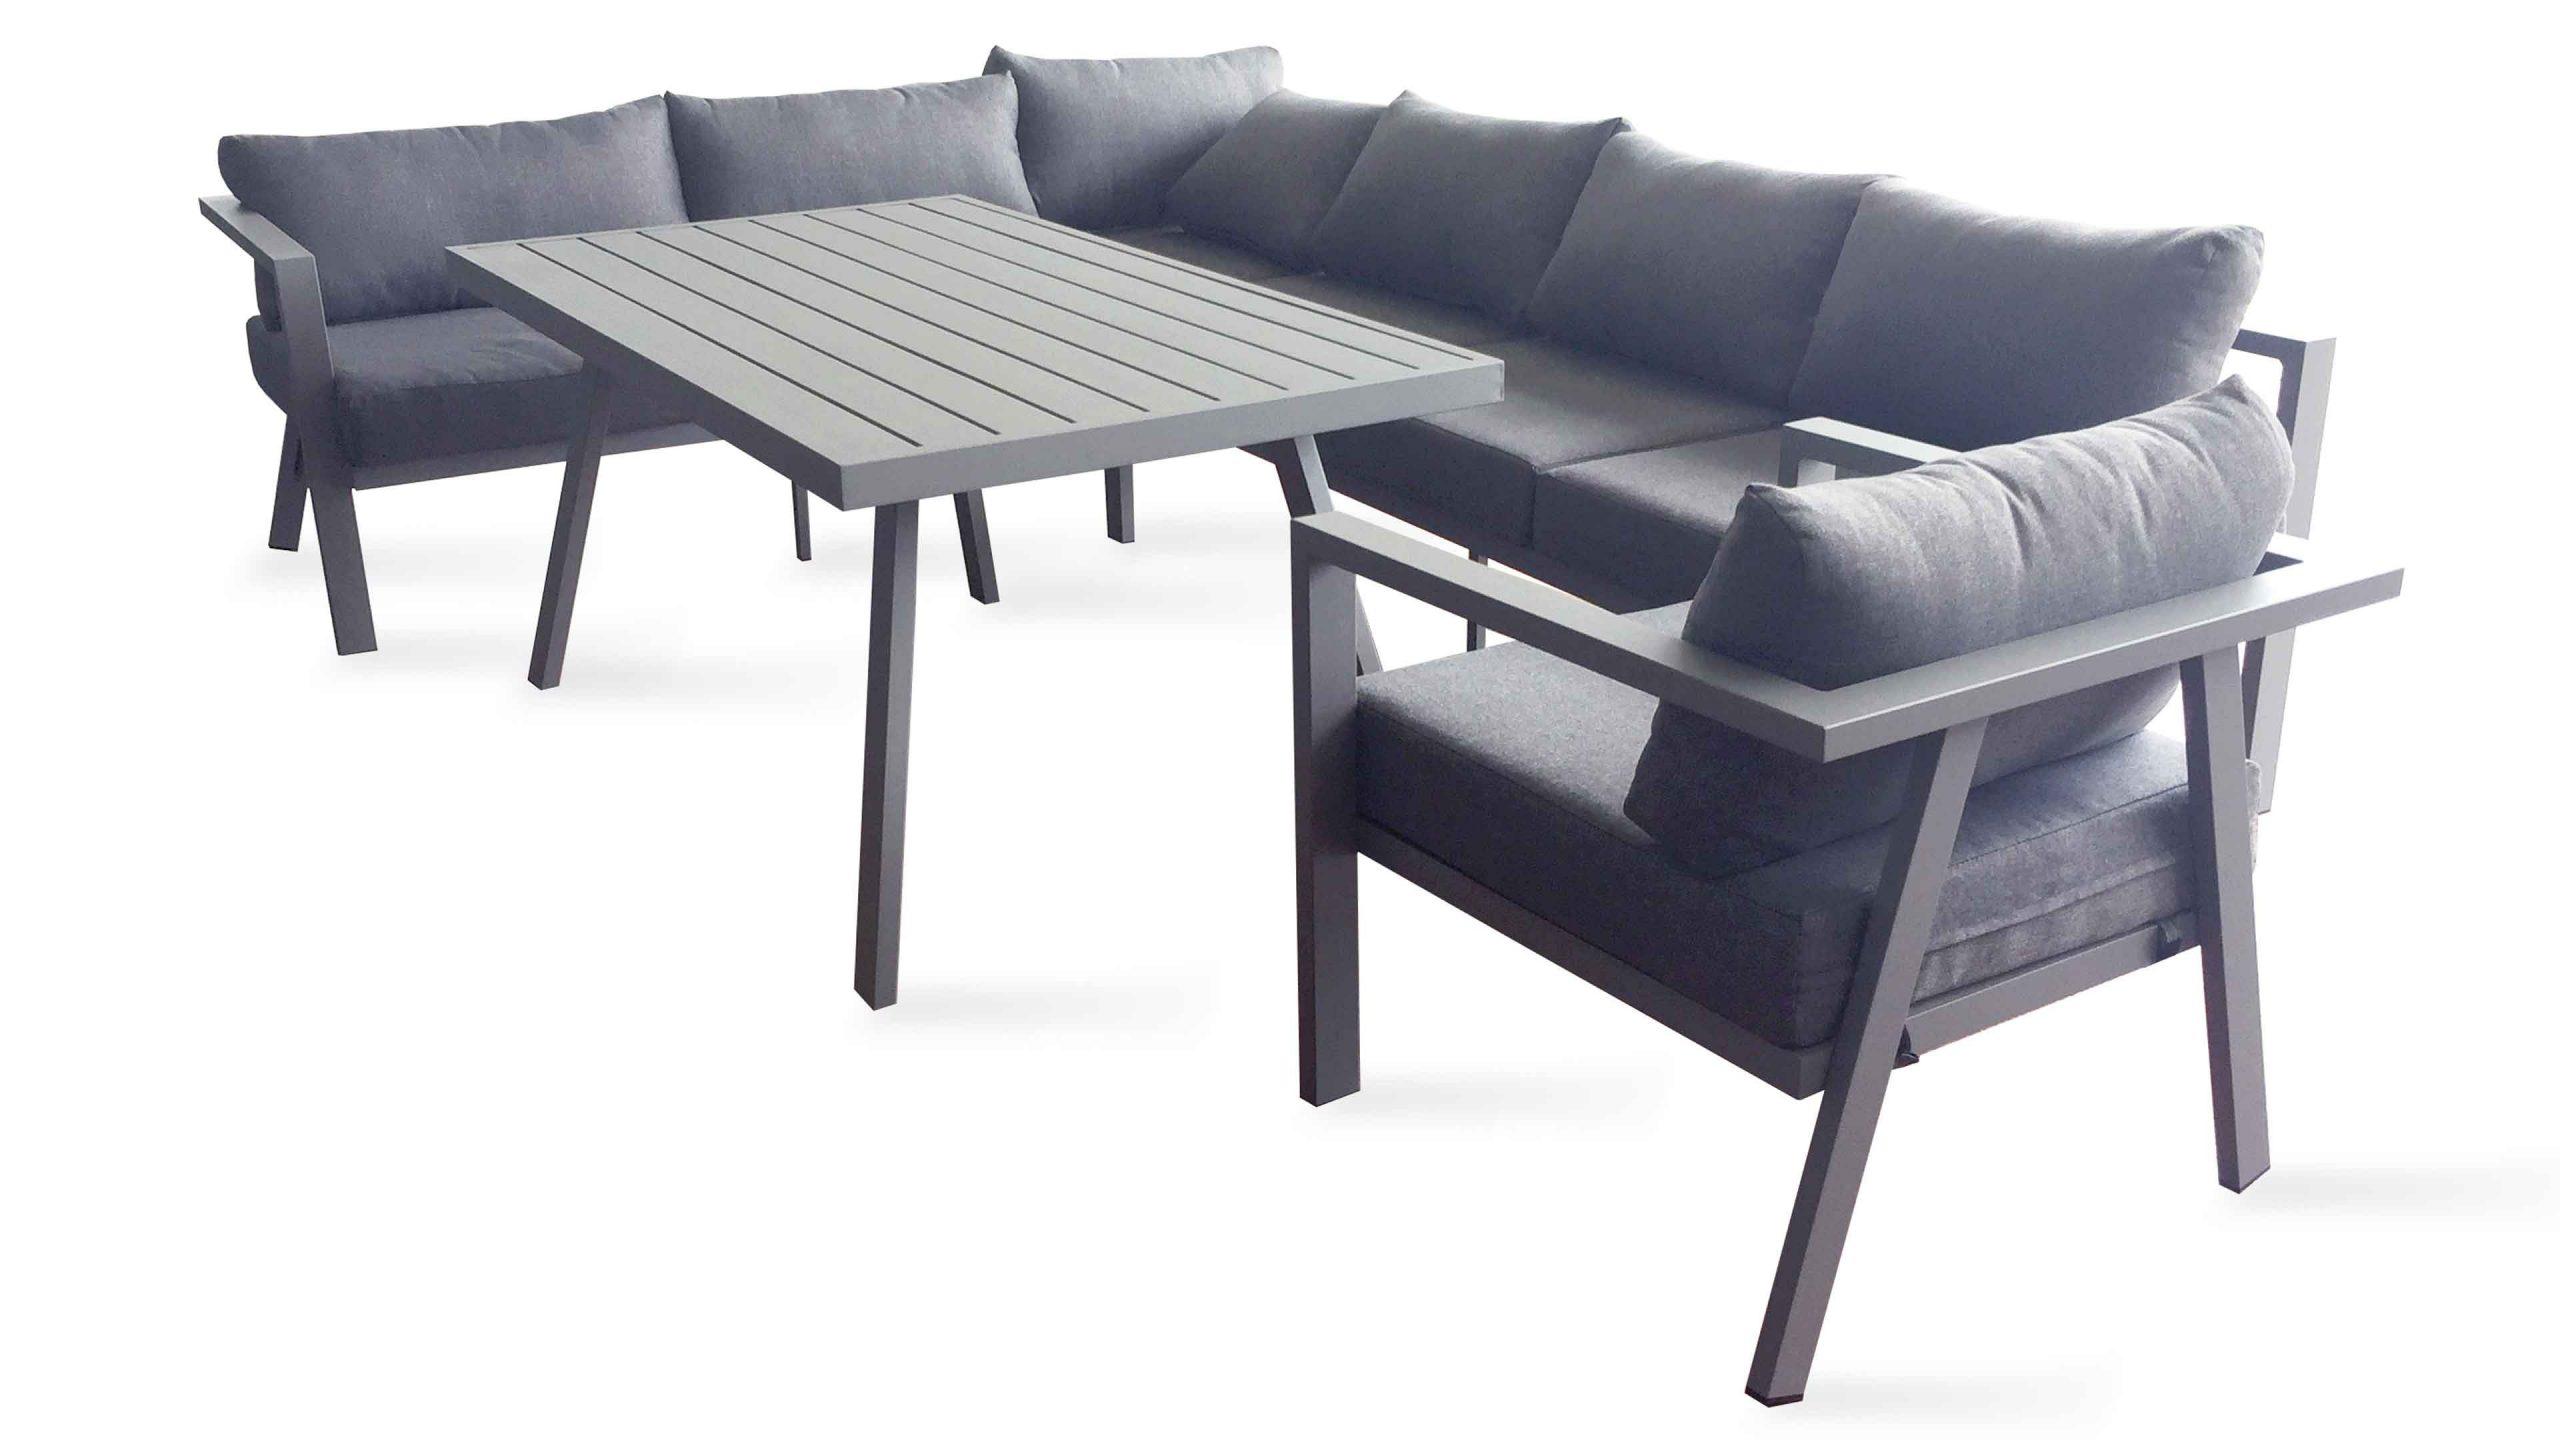 Salon De Jardin Angle Aluminium - The Best Undercut Ponytail dedans Canapé D Angle De Jardin